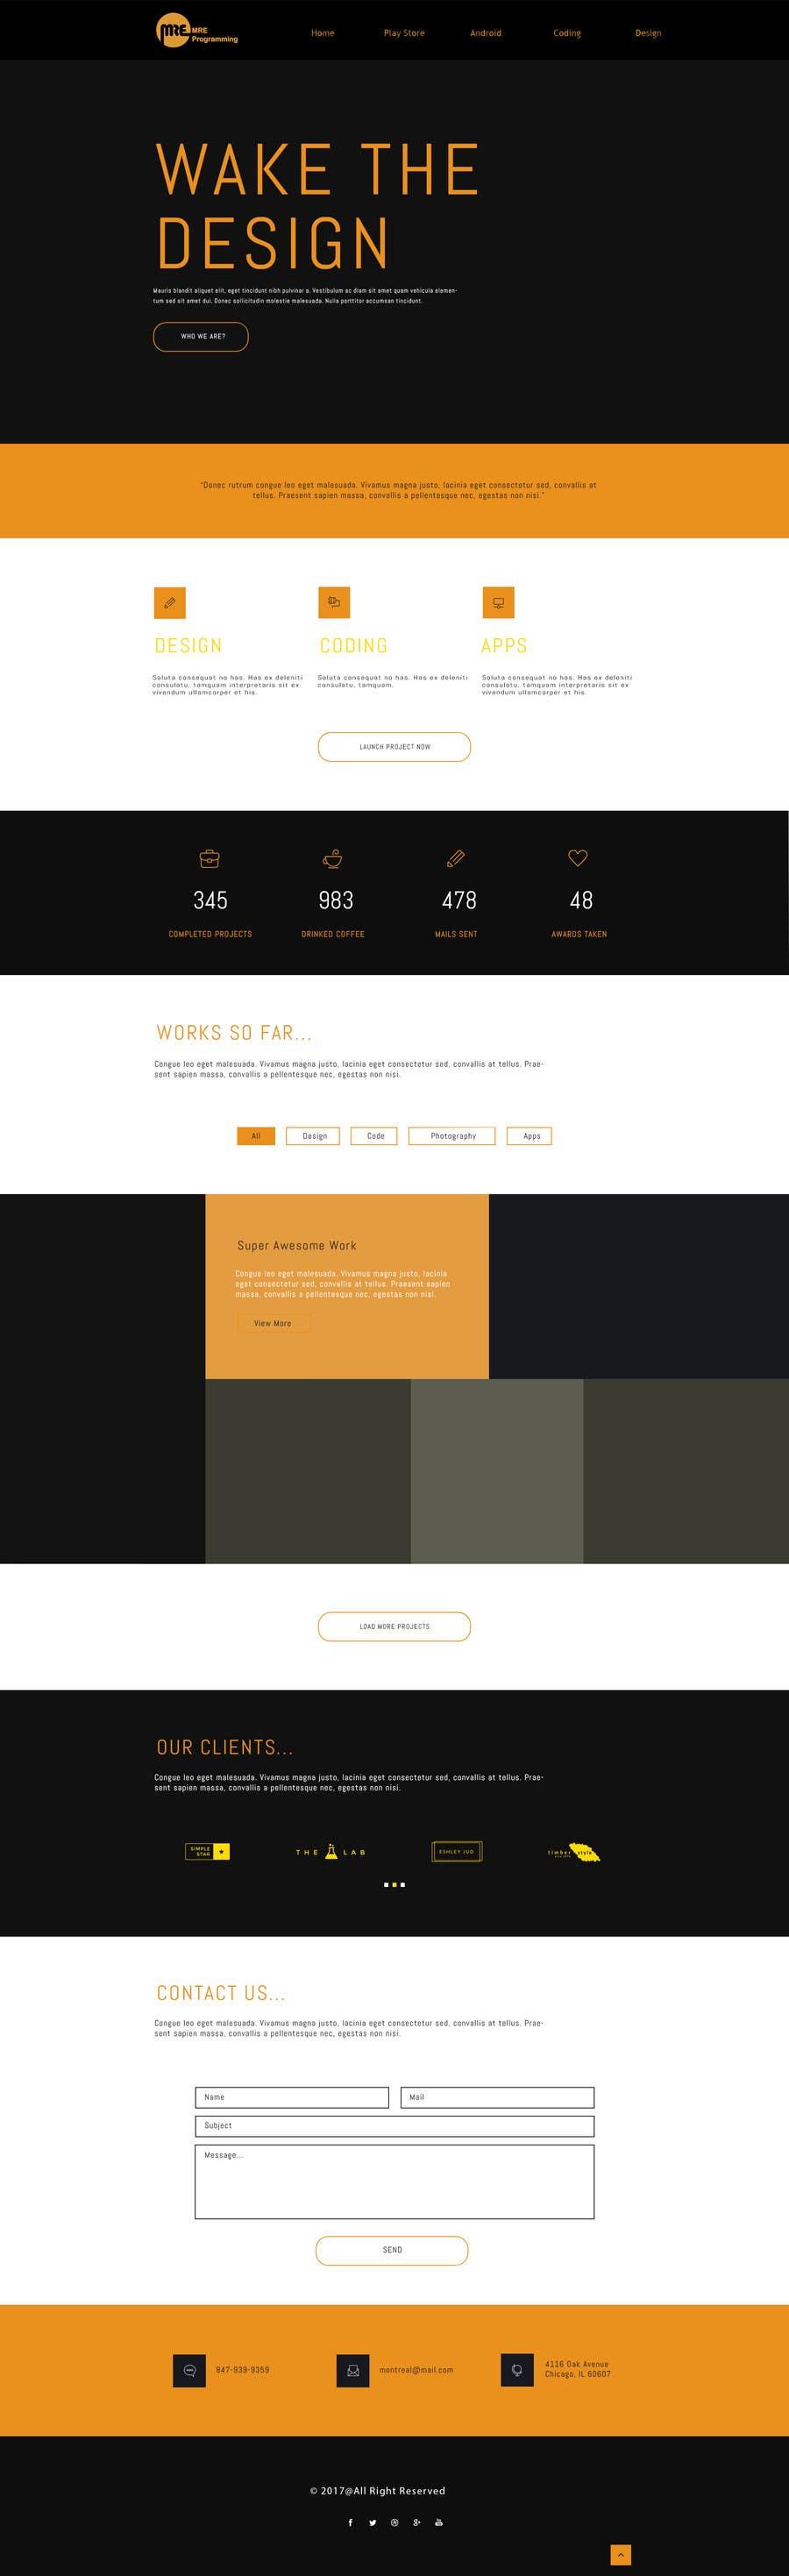 Contest Entry #                                        9                                      for                                         Design a Website Mockup (Design ideas not HTML)